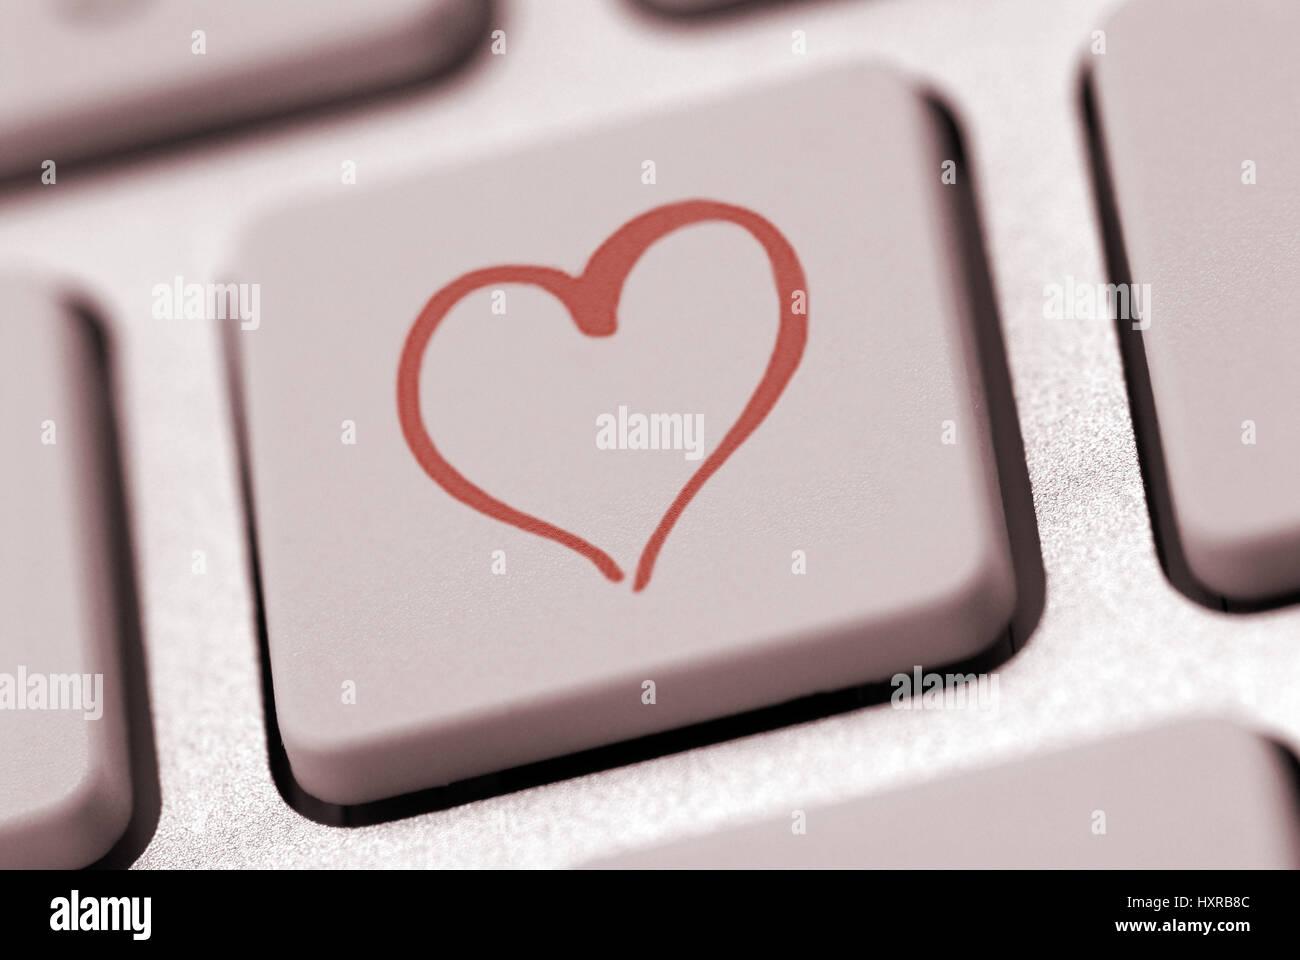 Mosmisch online dating australia